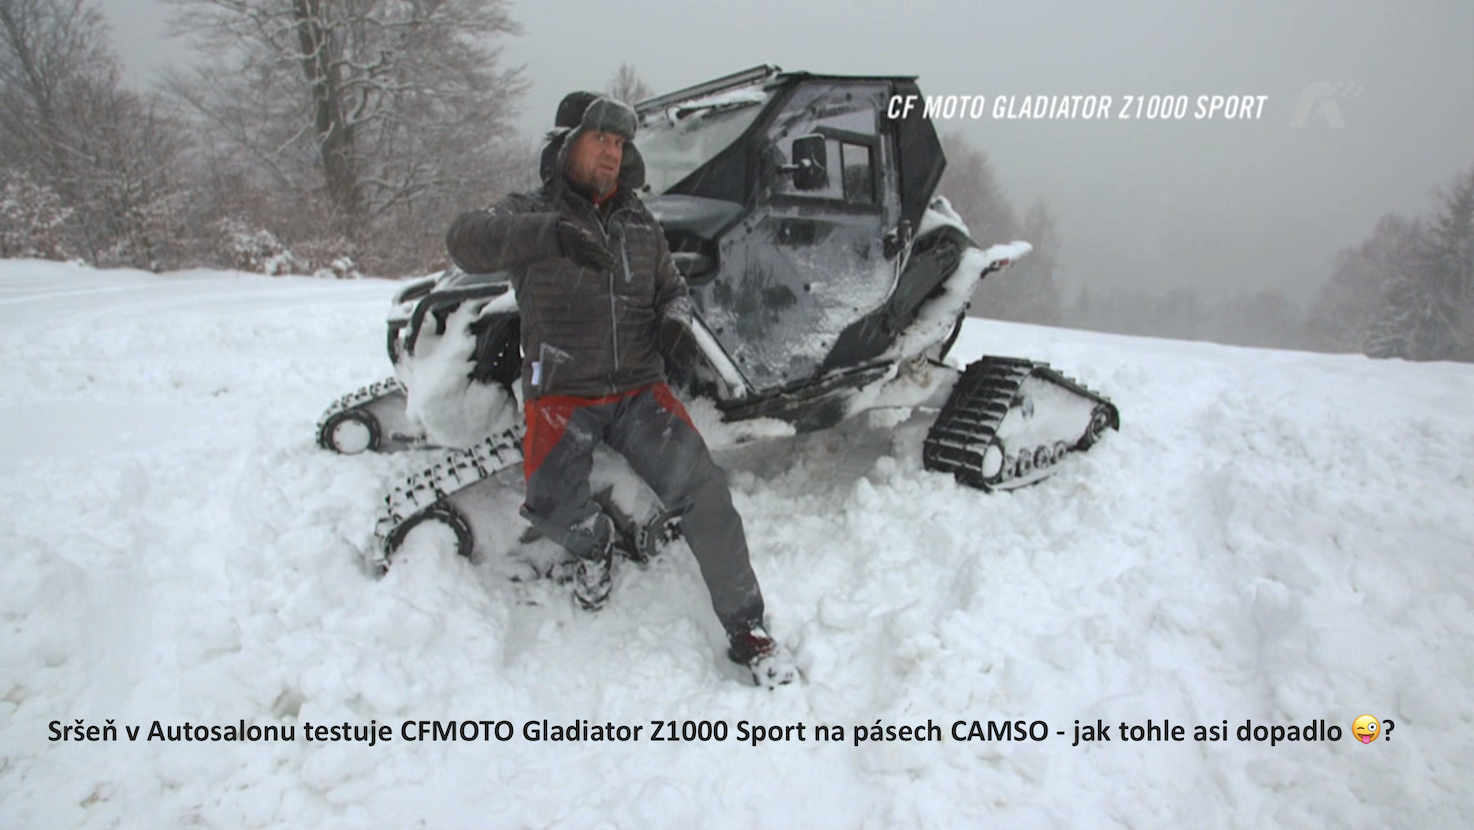 Pepa Sršeň v Autosalonu na CFMOTO Gladiator Z1000 Sport